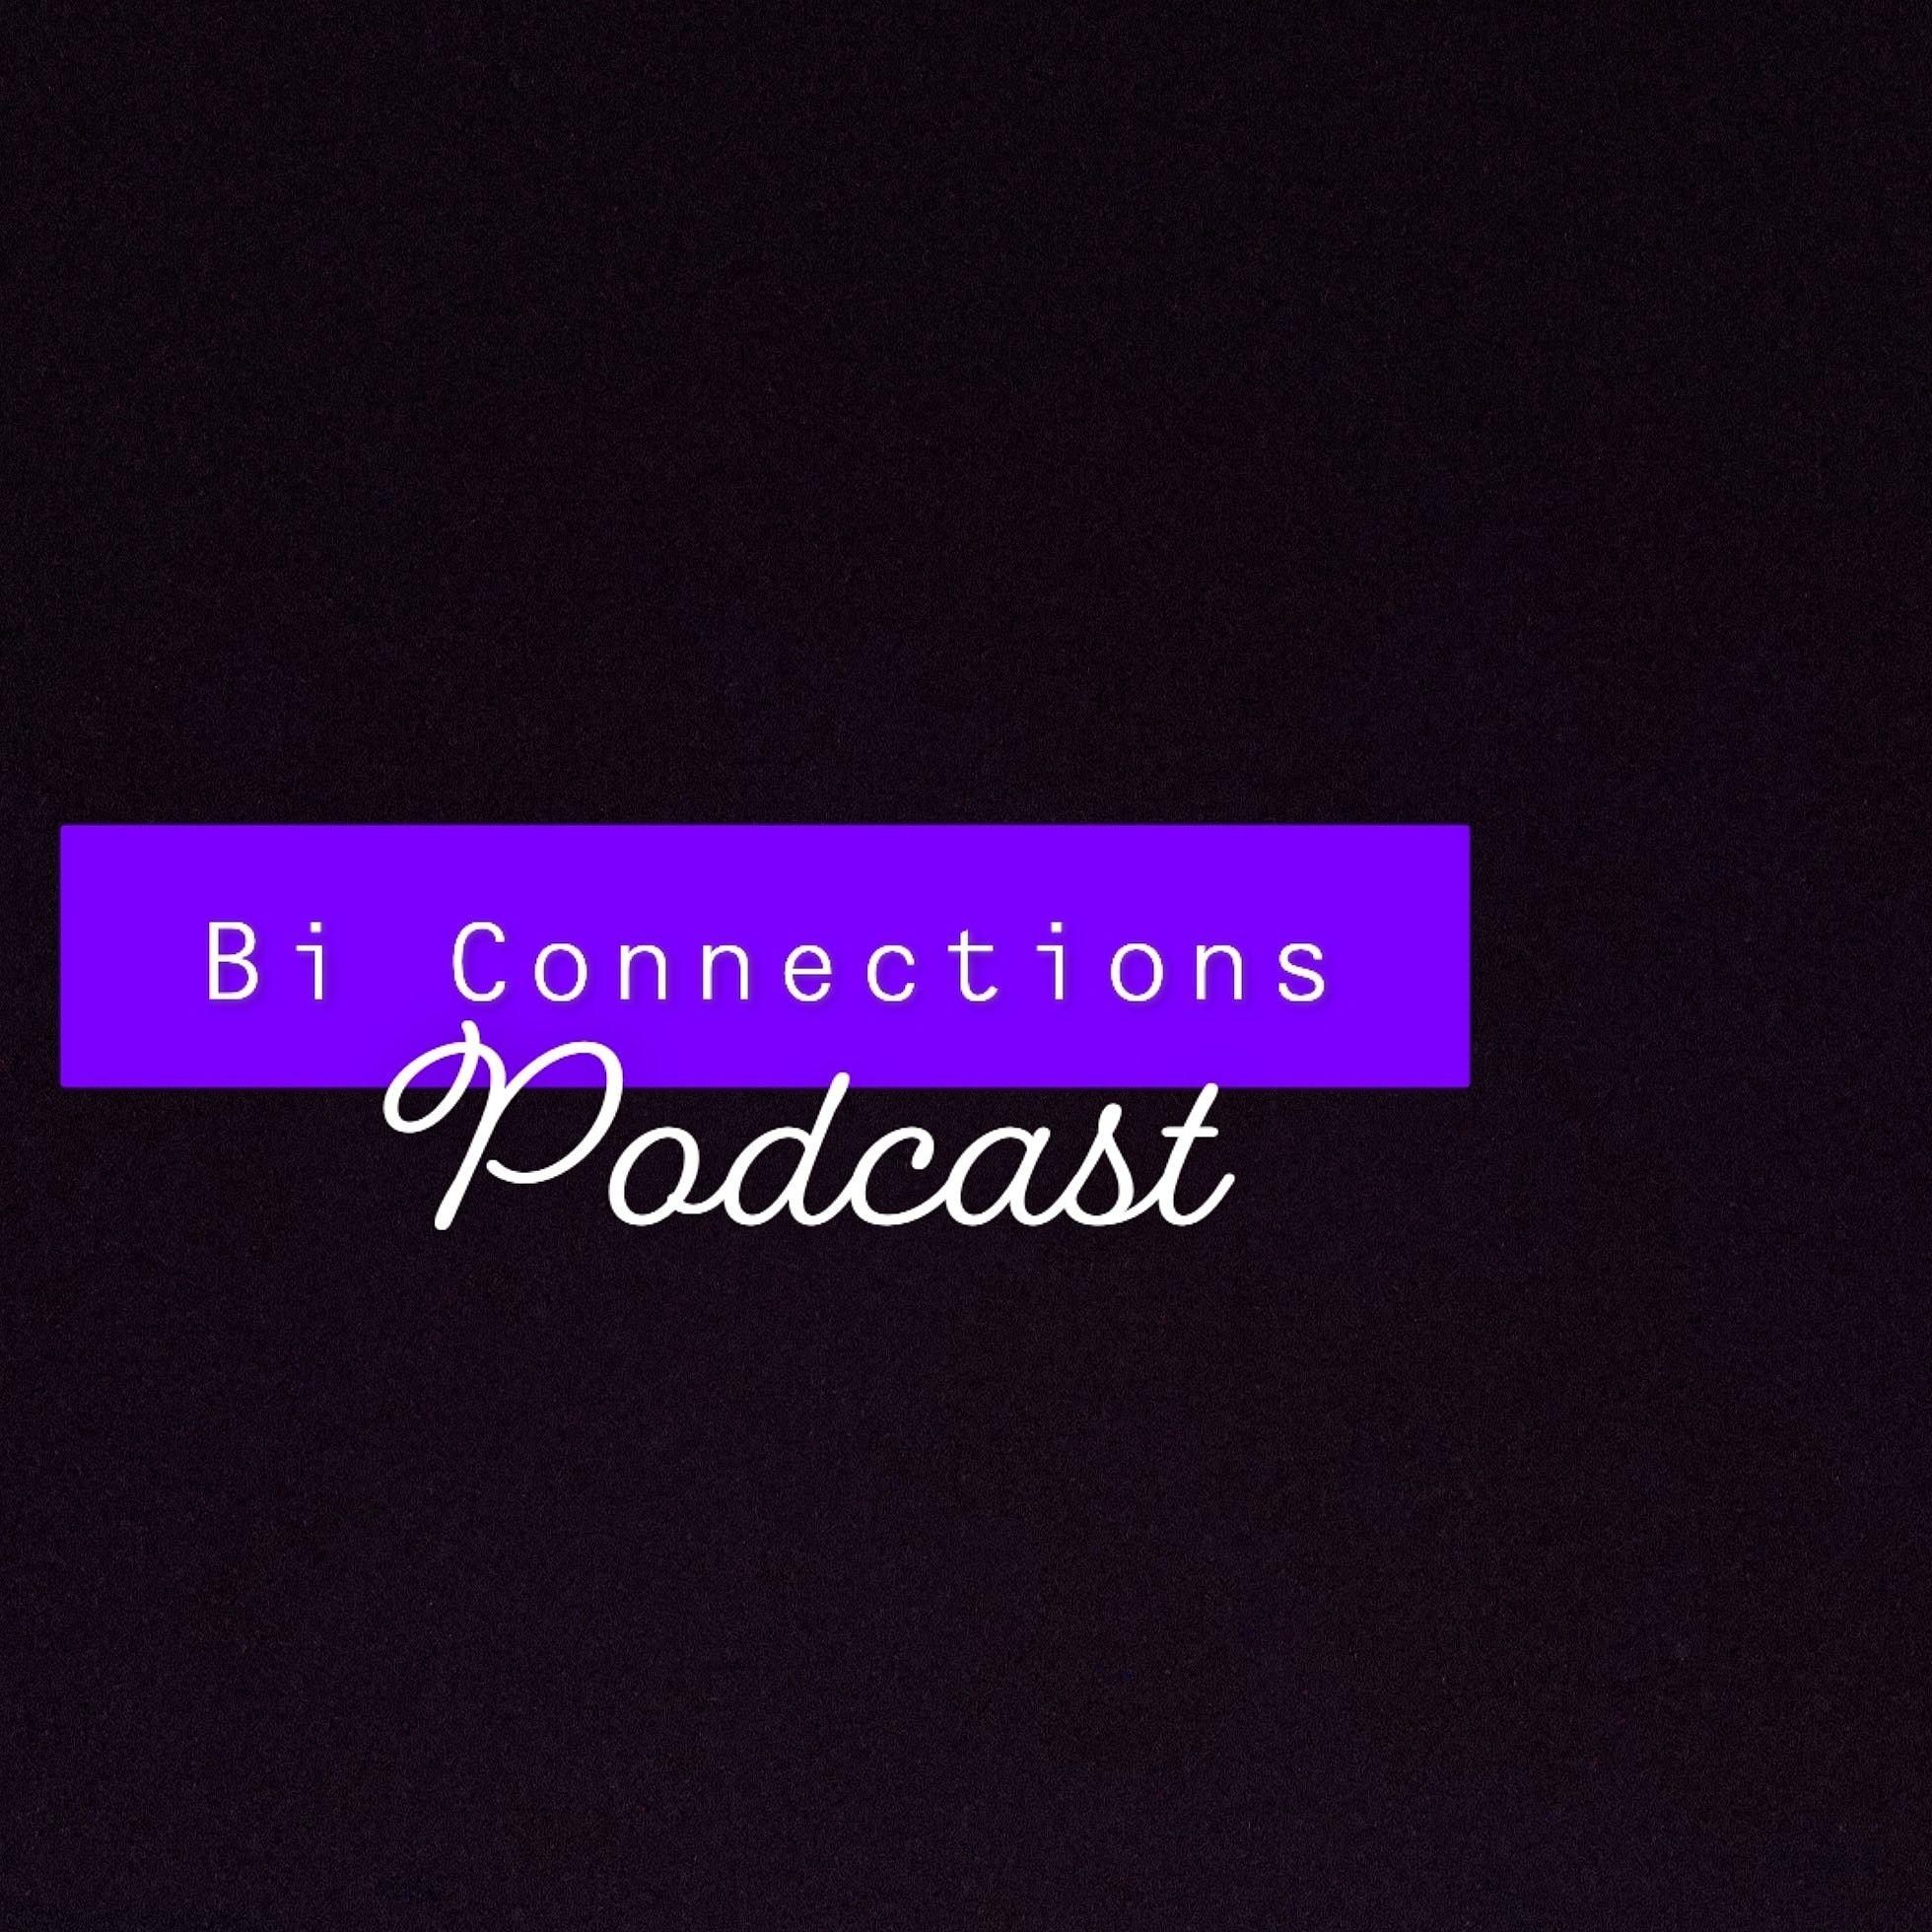 Bi Connections